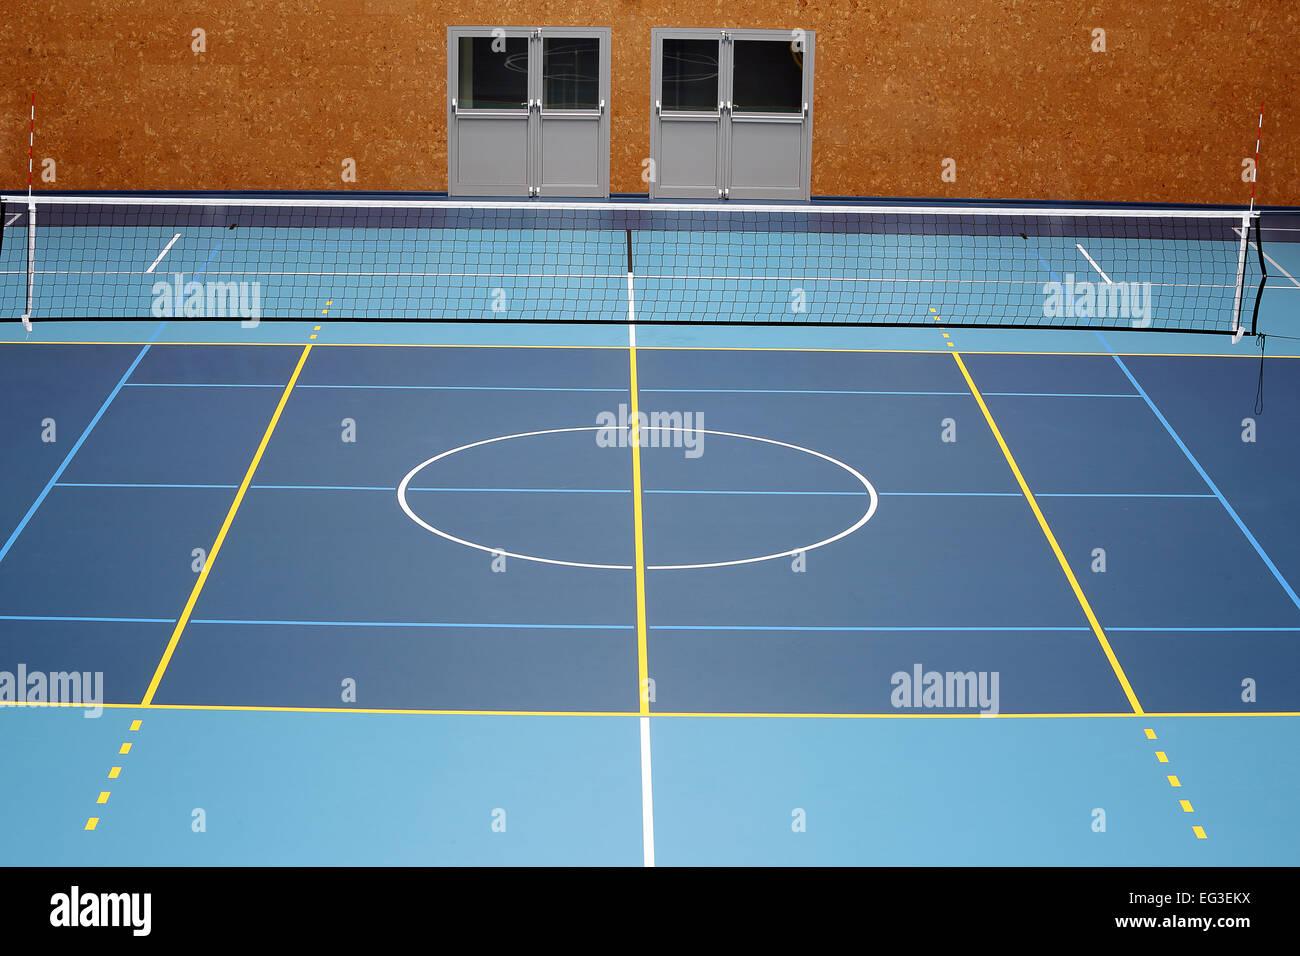 Volleyball Court Indoor Stock Photos & Volleyball Court Indoor Stock ...